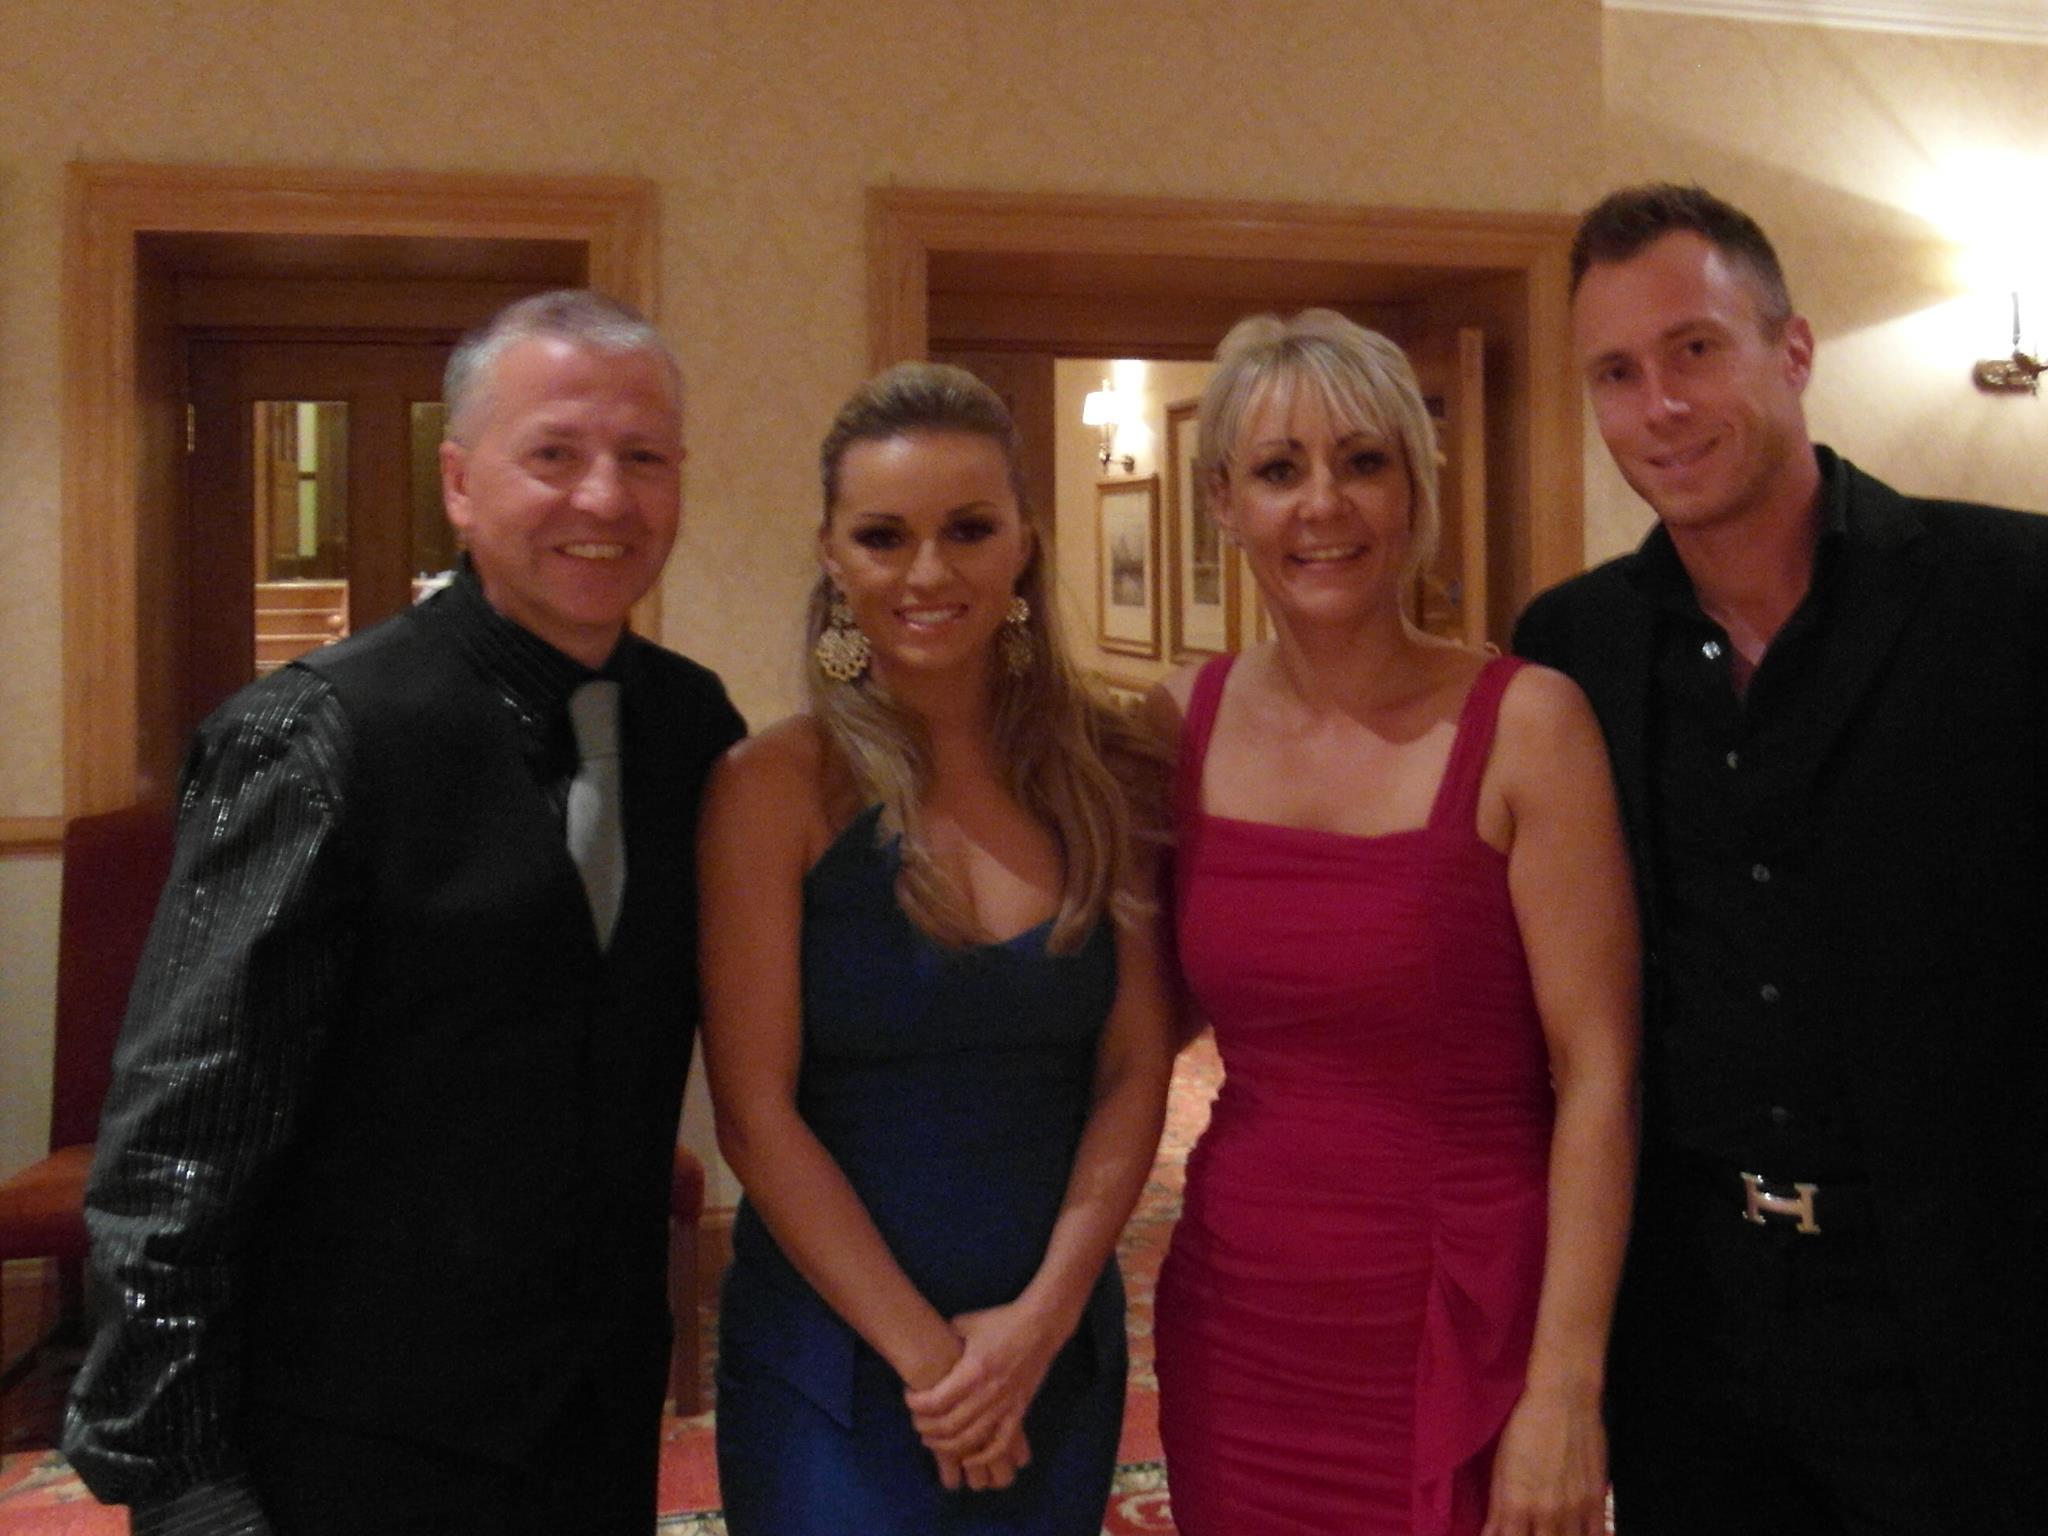 Gary, Ola, Fiona & James